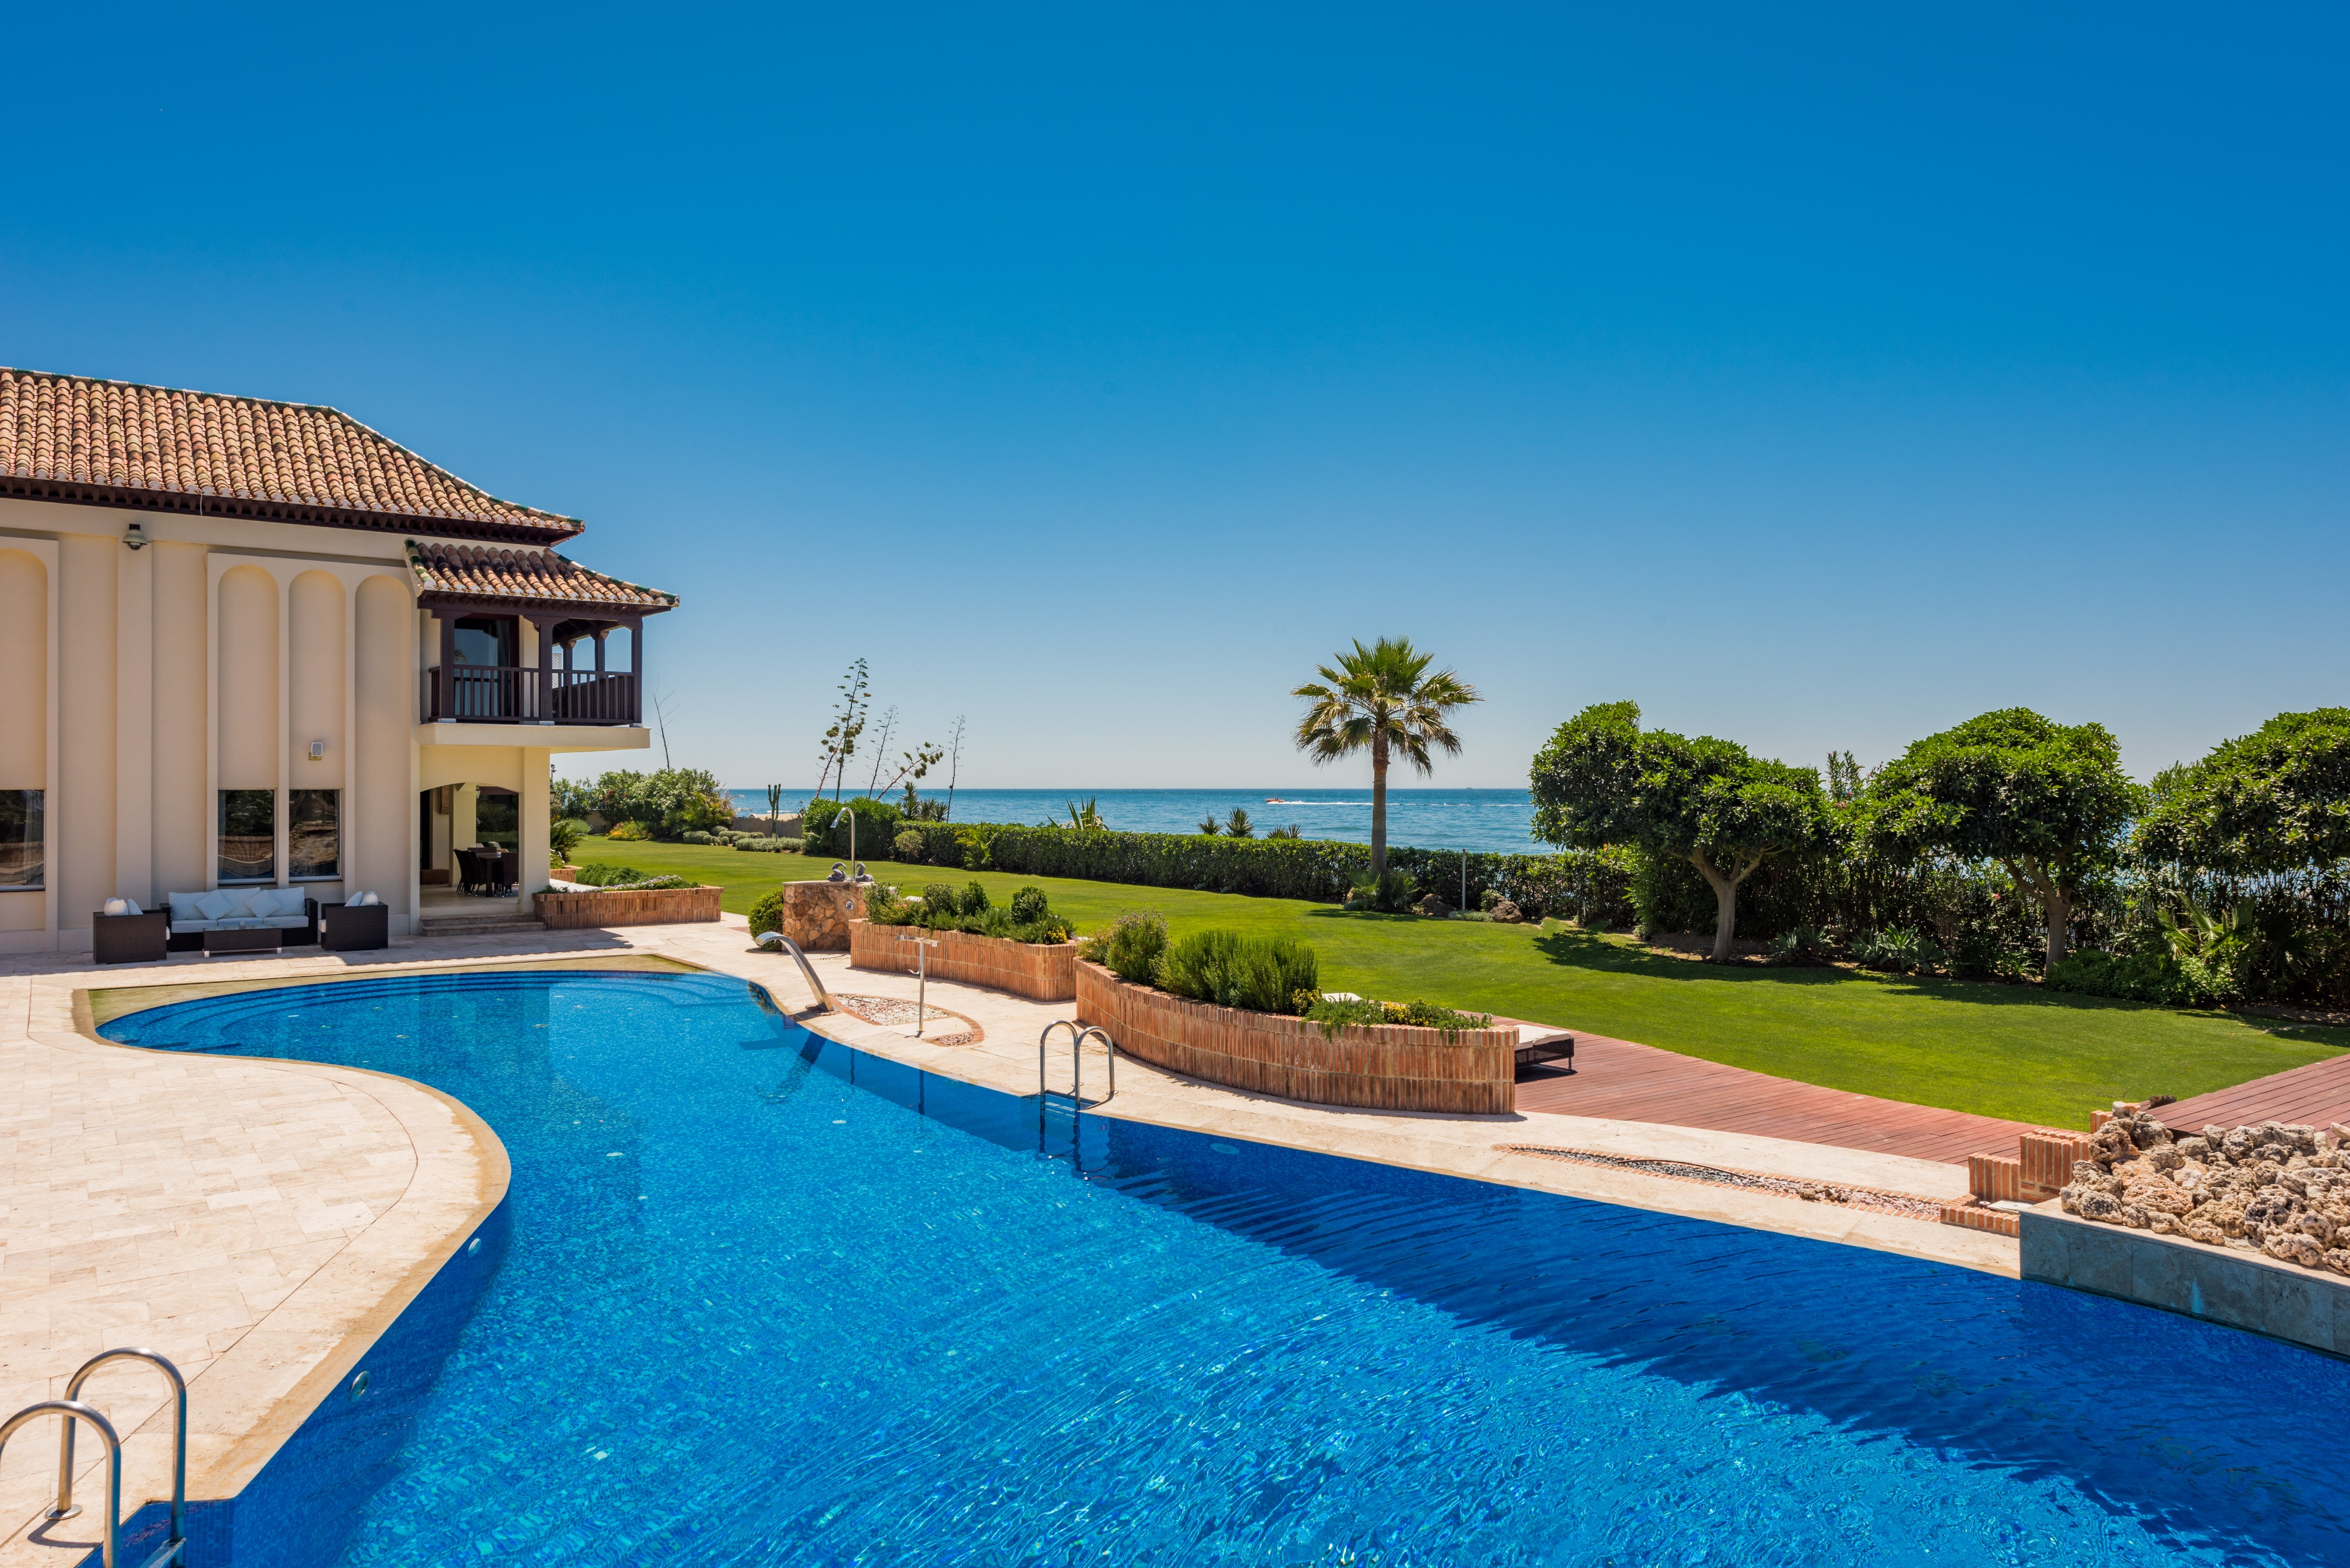 Beachside properties in Marbella